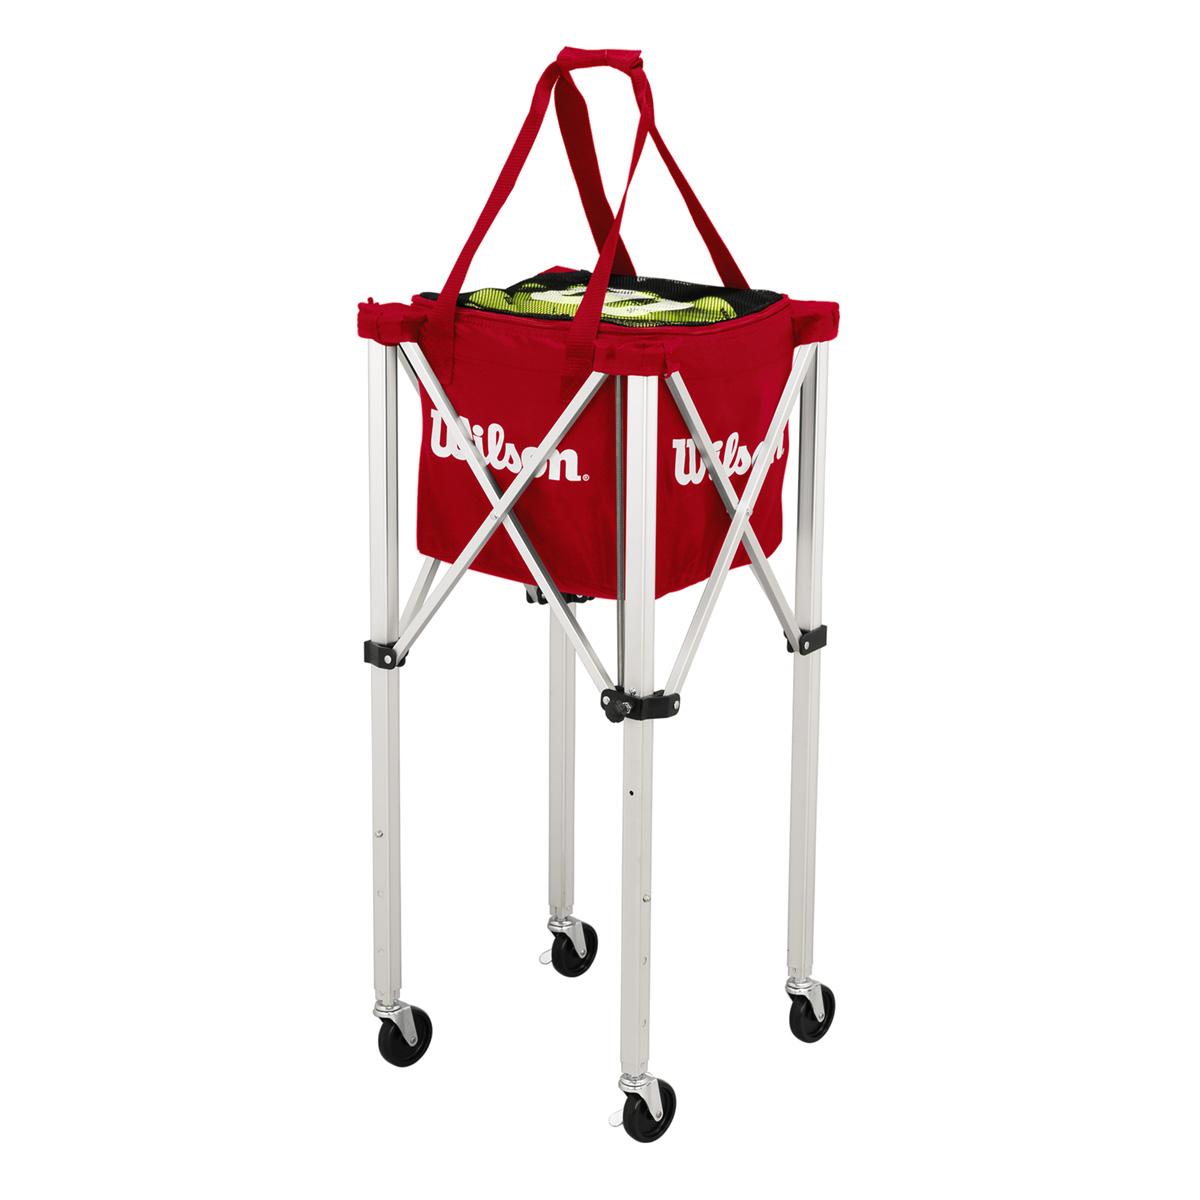 Easyball Cart